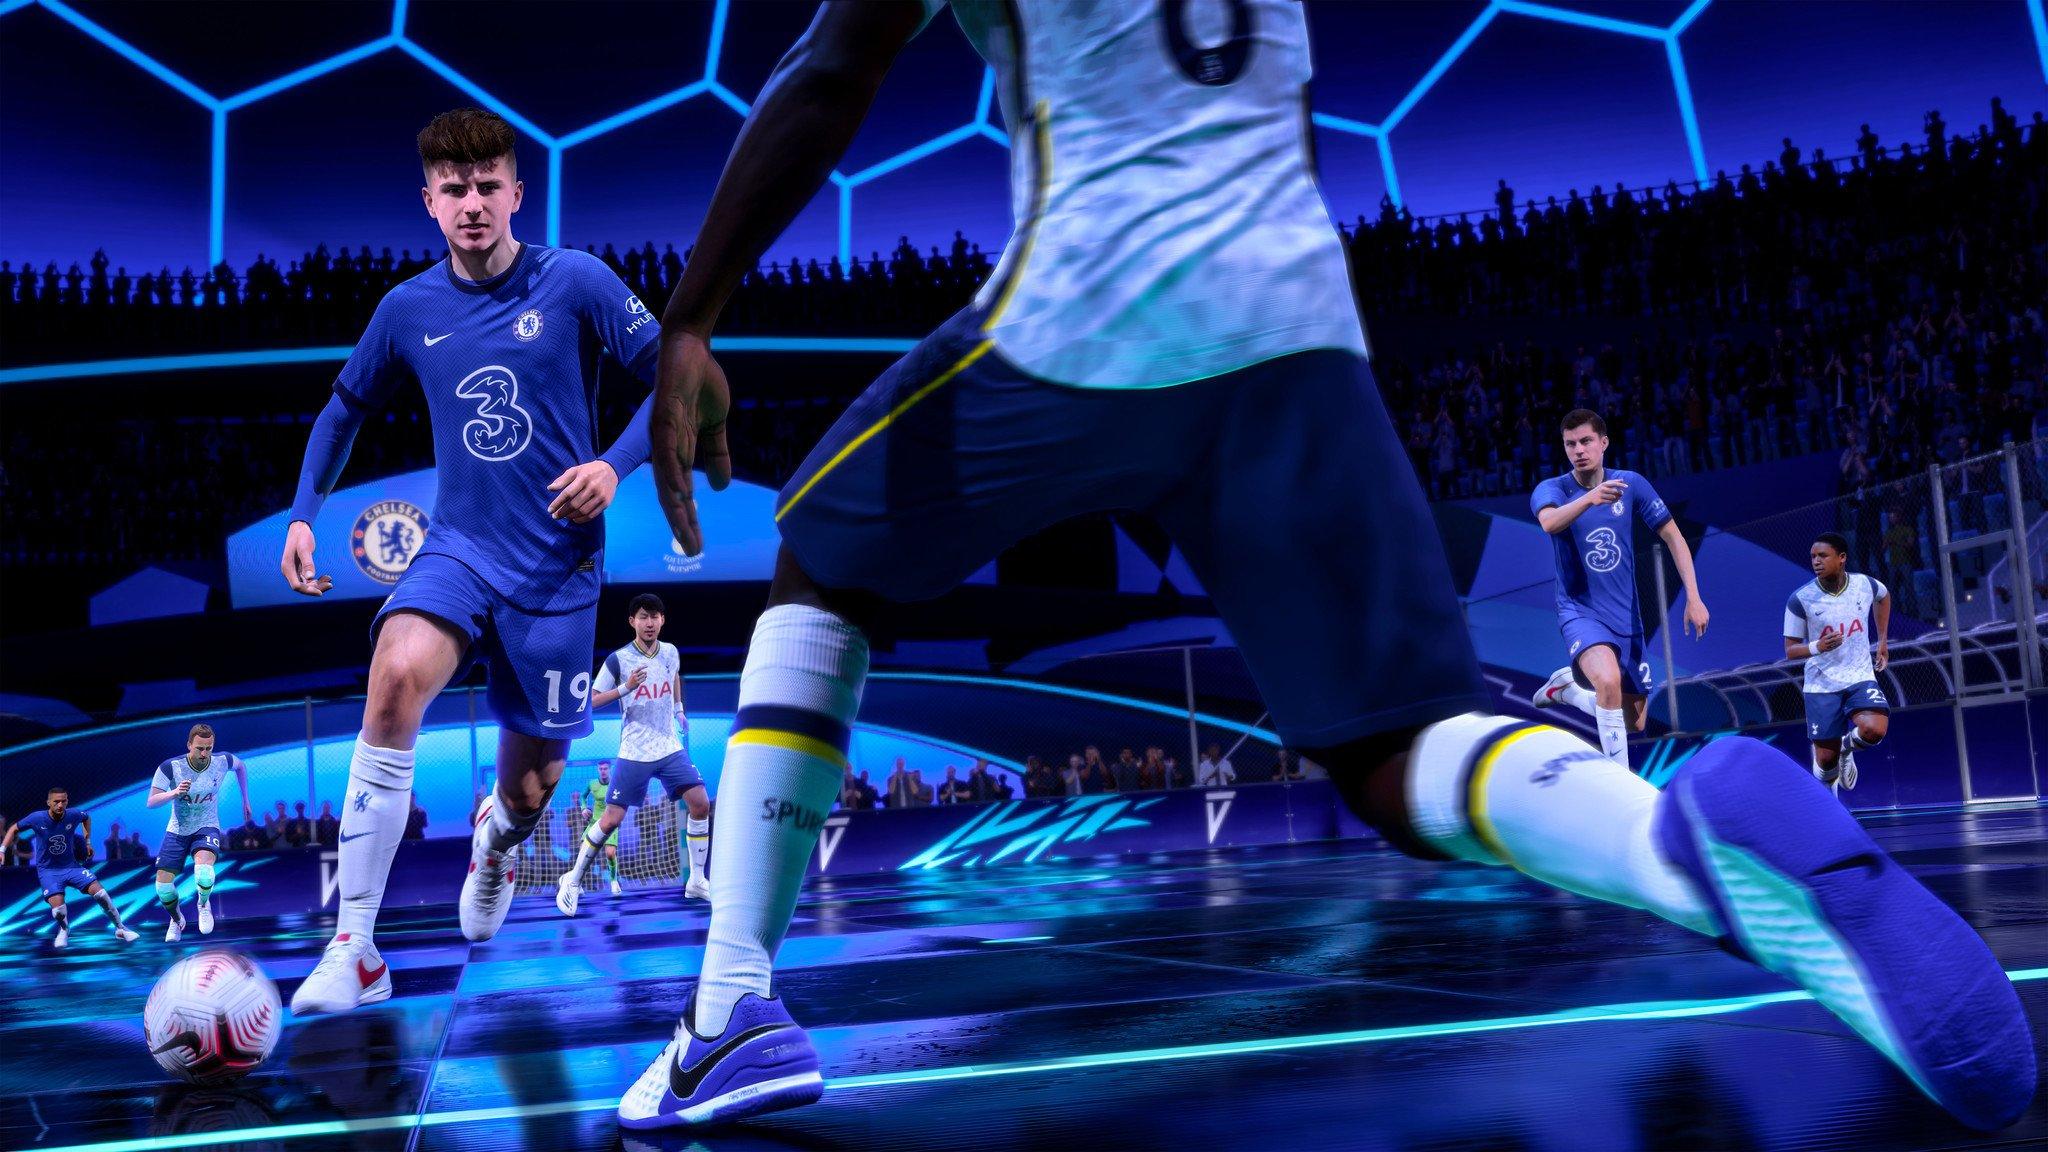 نسخهی پلیاستیشن 5 بازی فیفا ۲۱